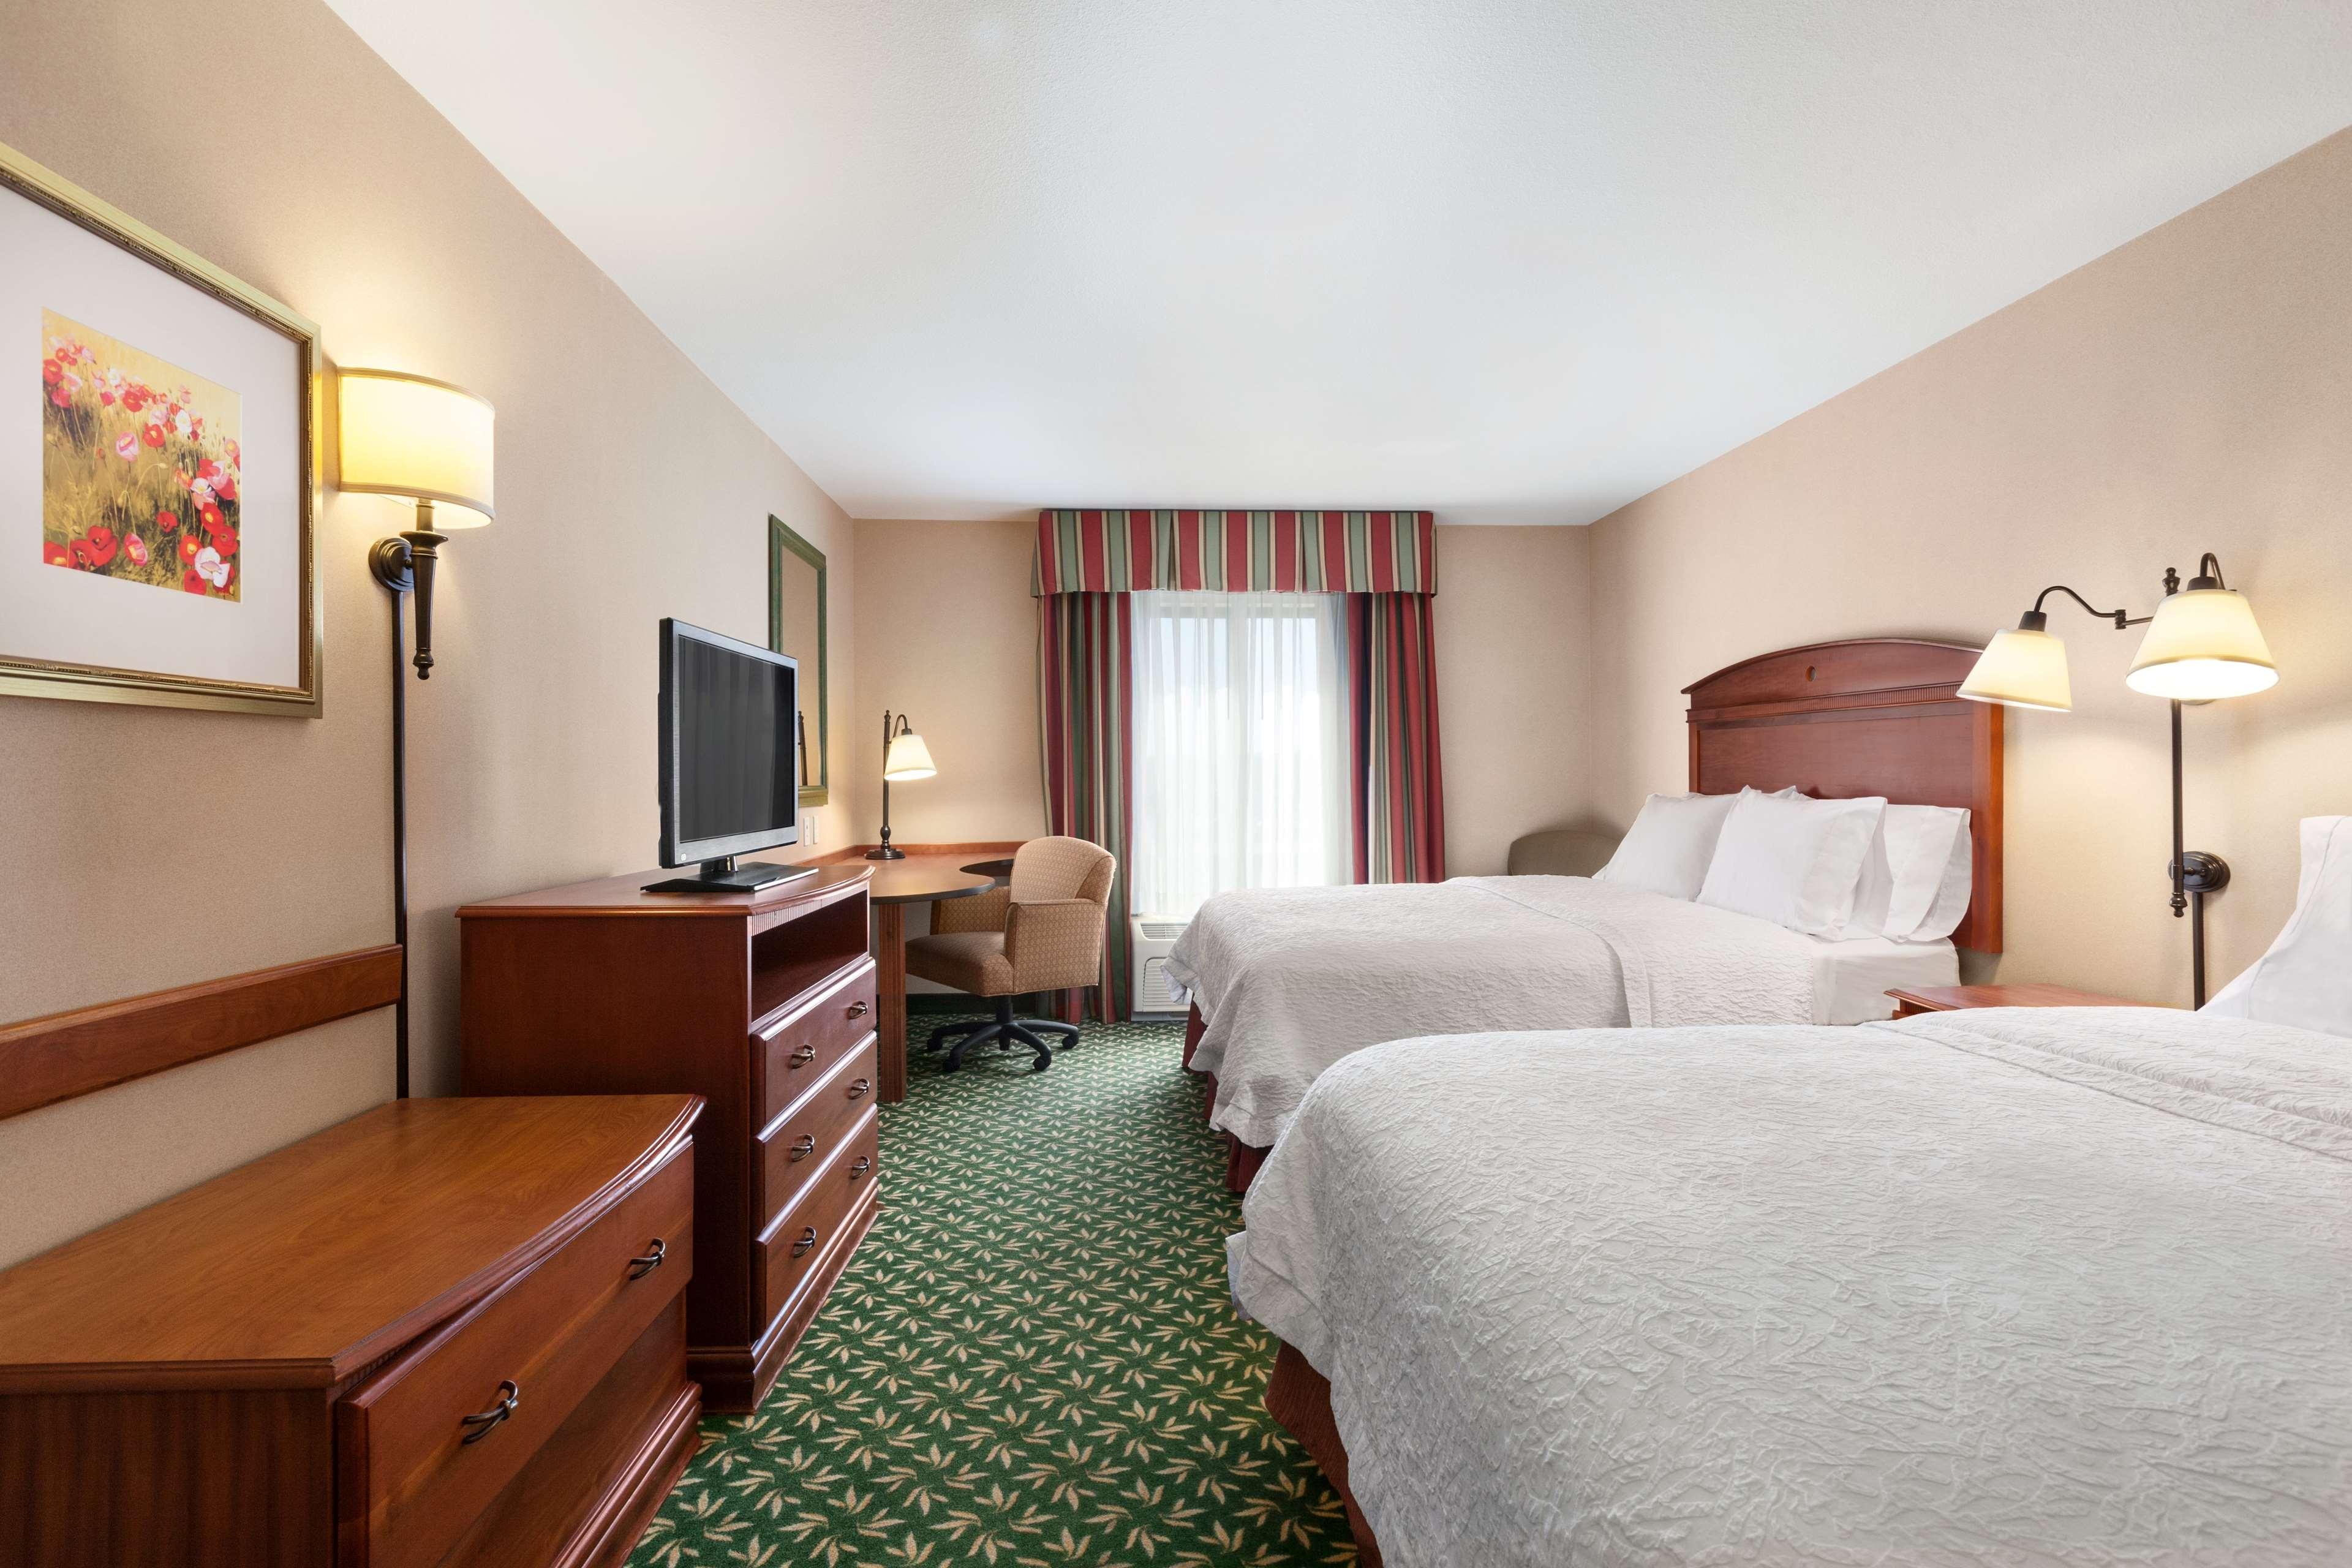 Hampton Inn & Suites Rohnert Park - Sonoma County image 12